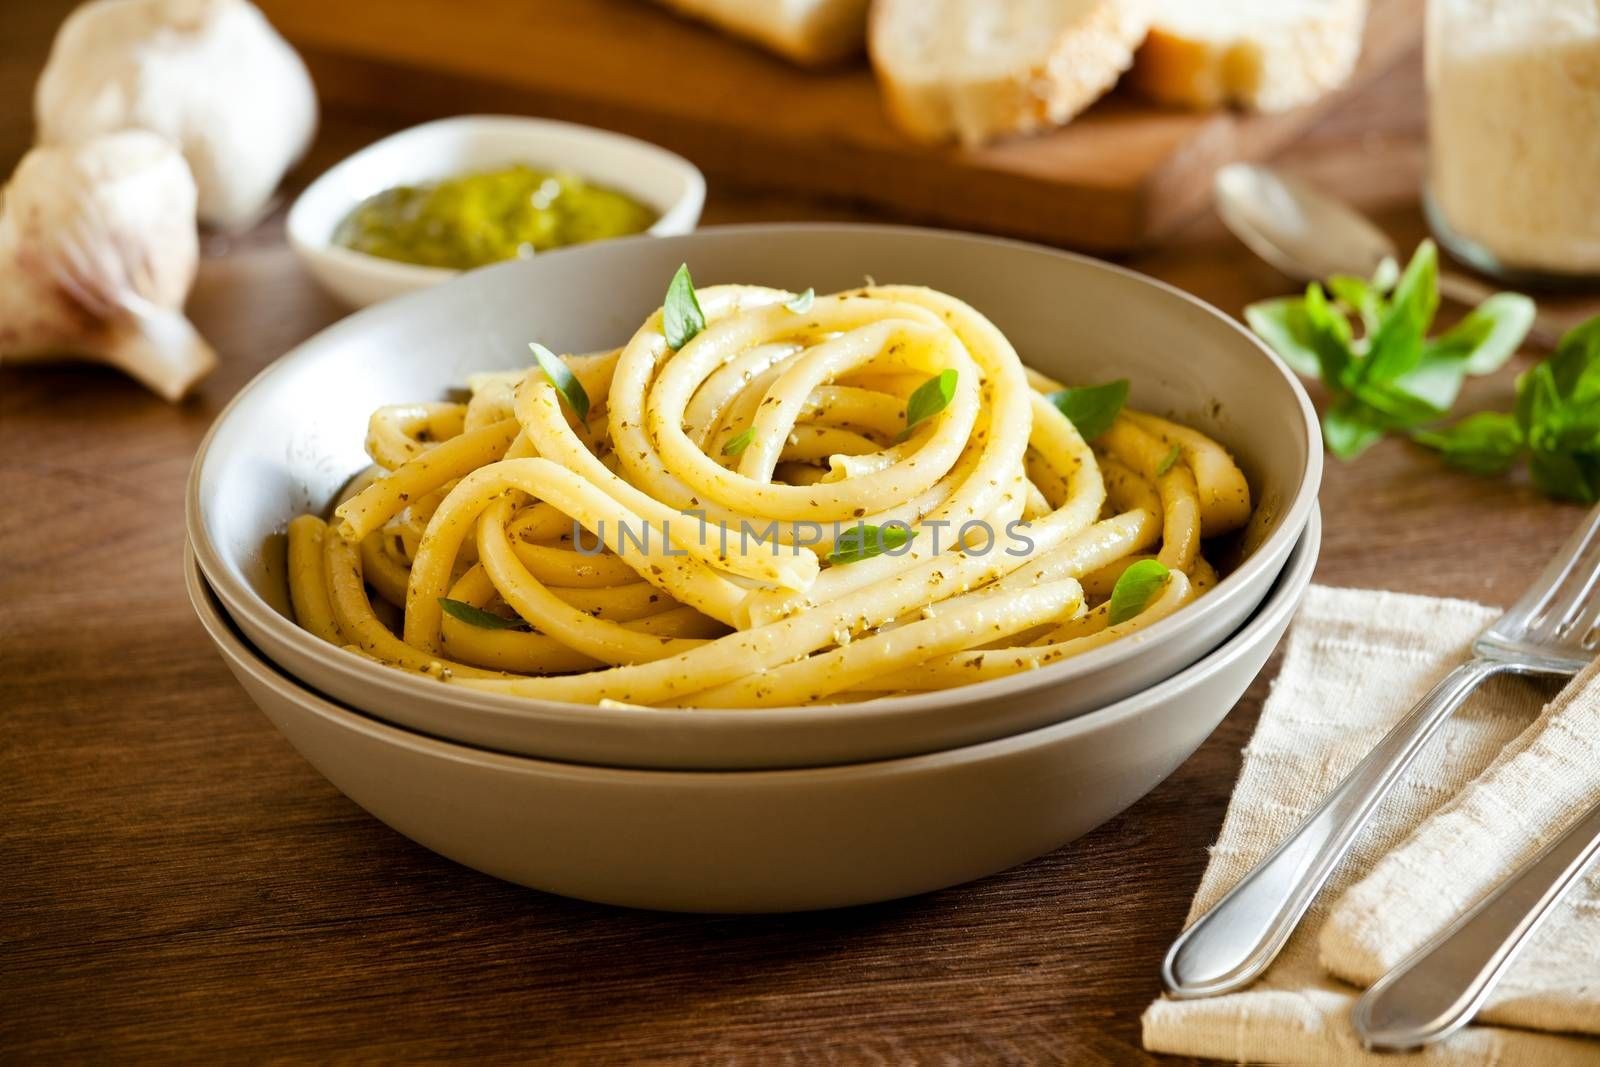 Bowl of pasta with homemade pesto sauce